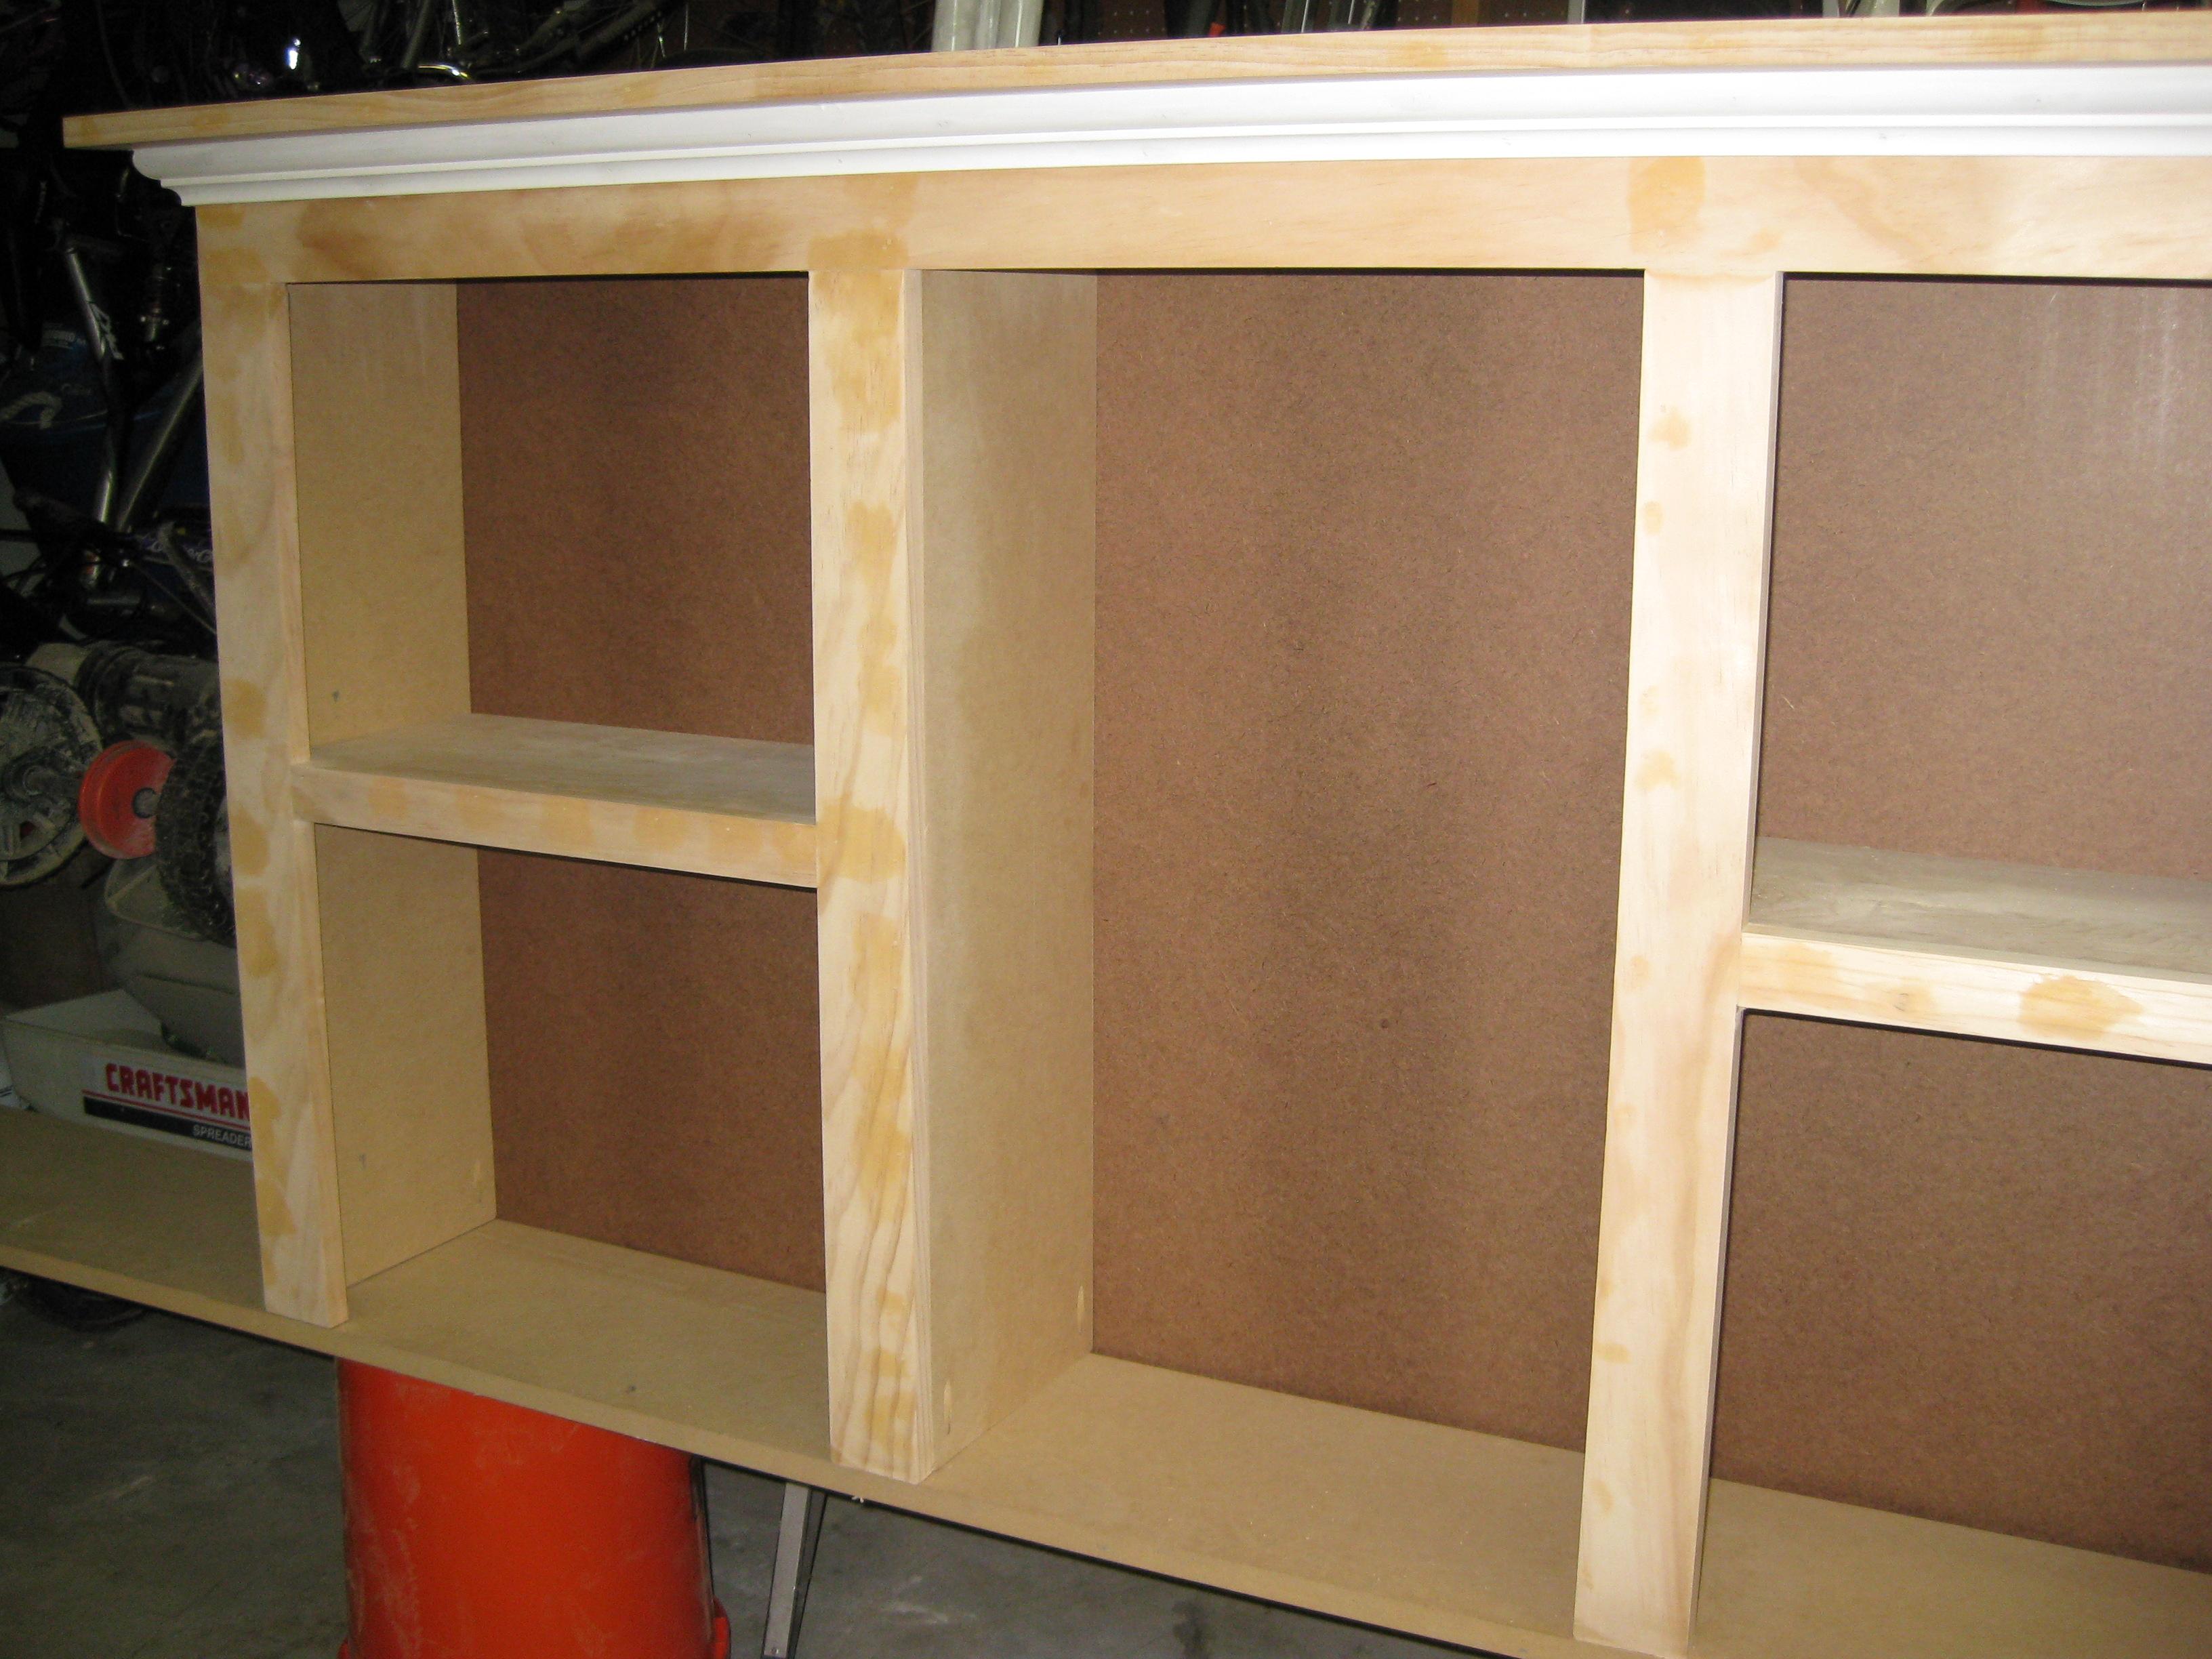 King Size Bookcase Headboard Plans